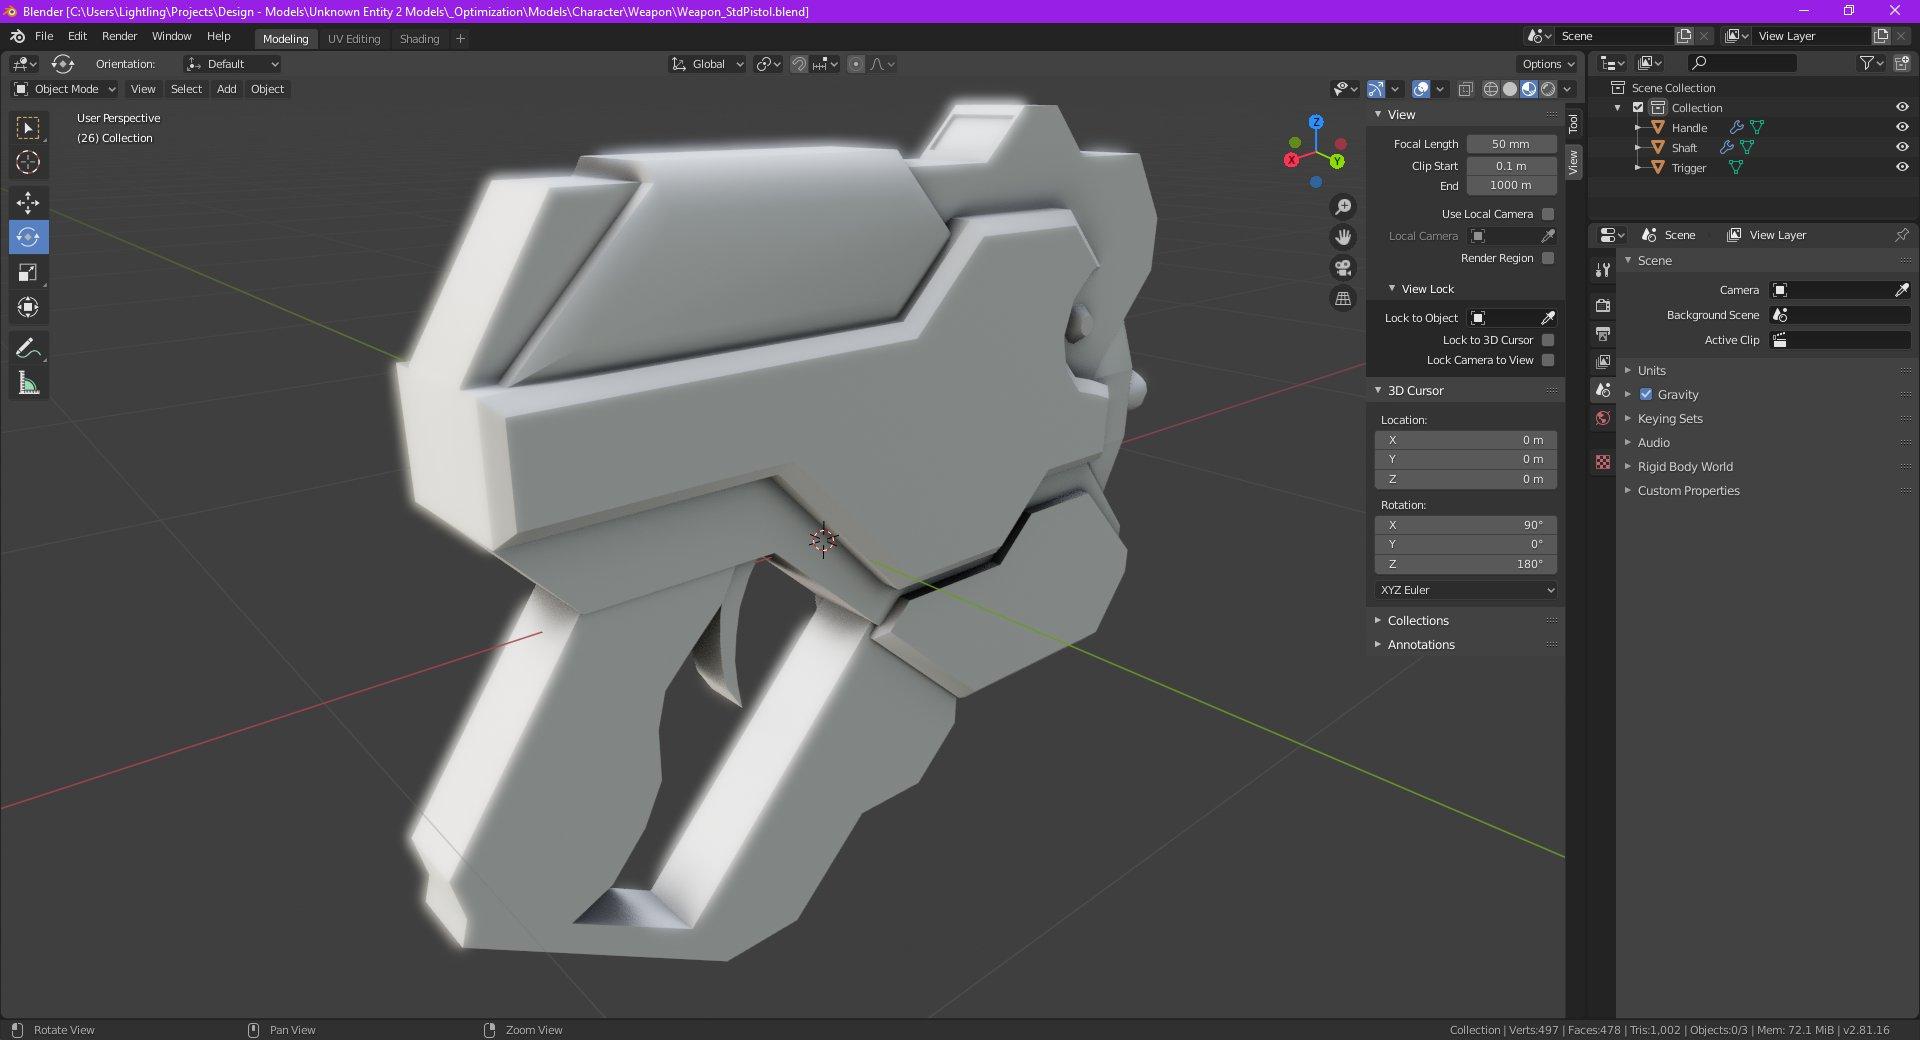 Render of new pistol model